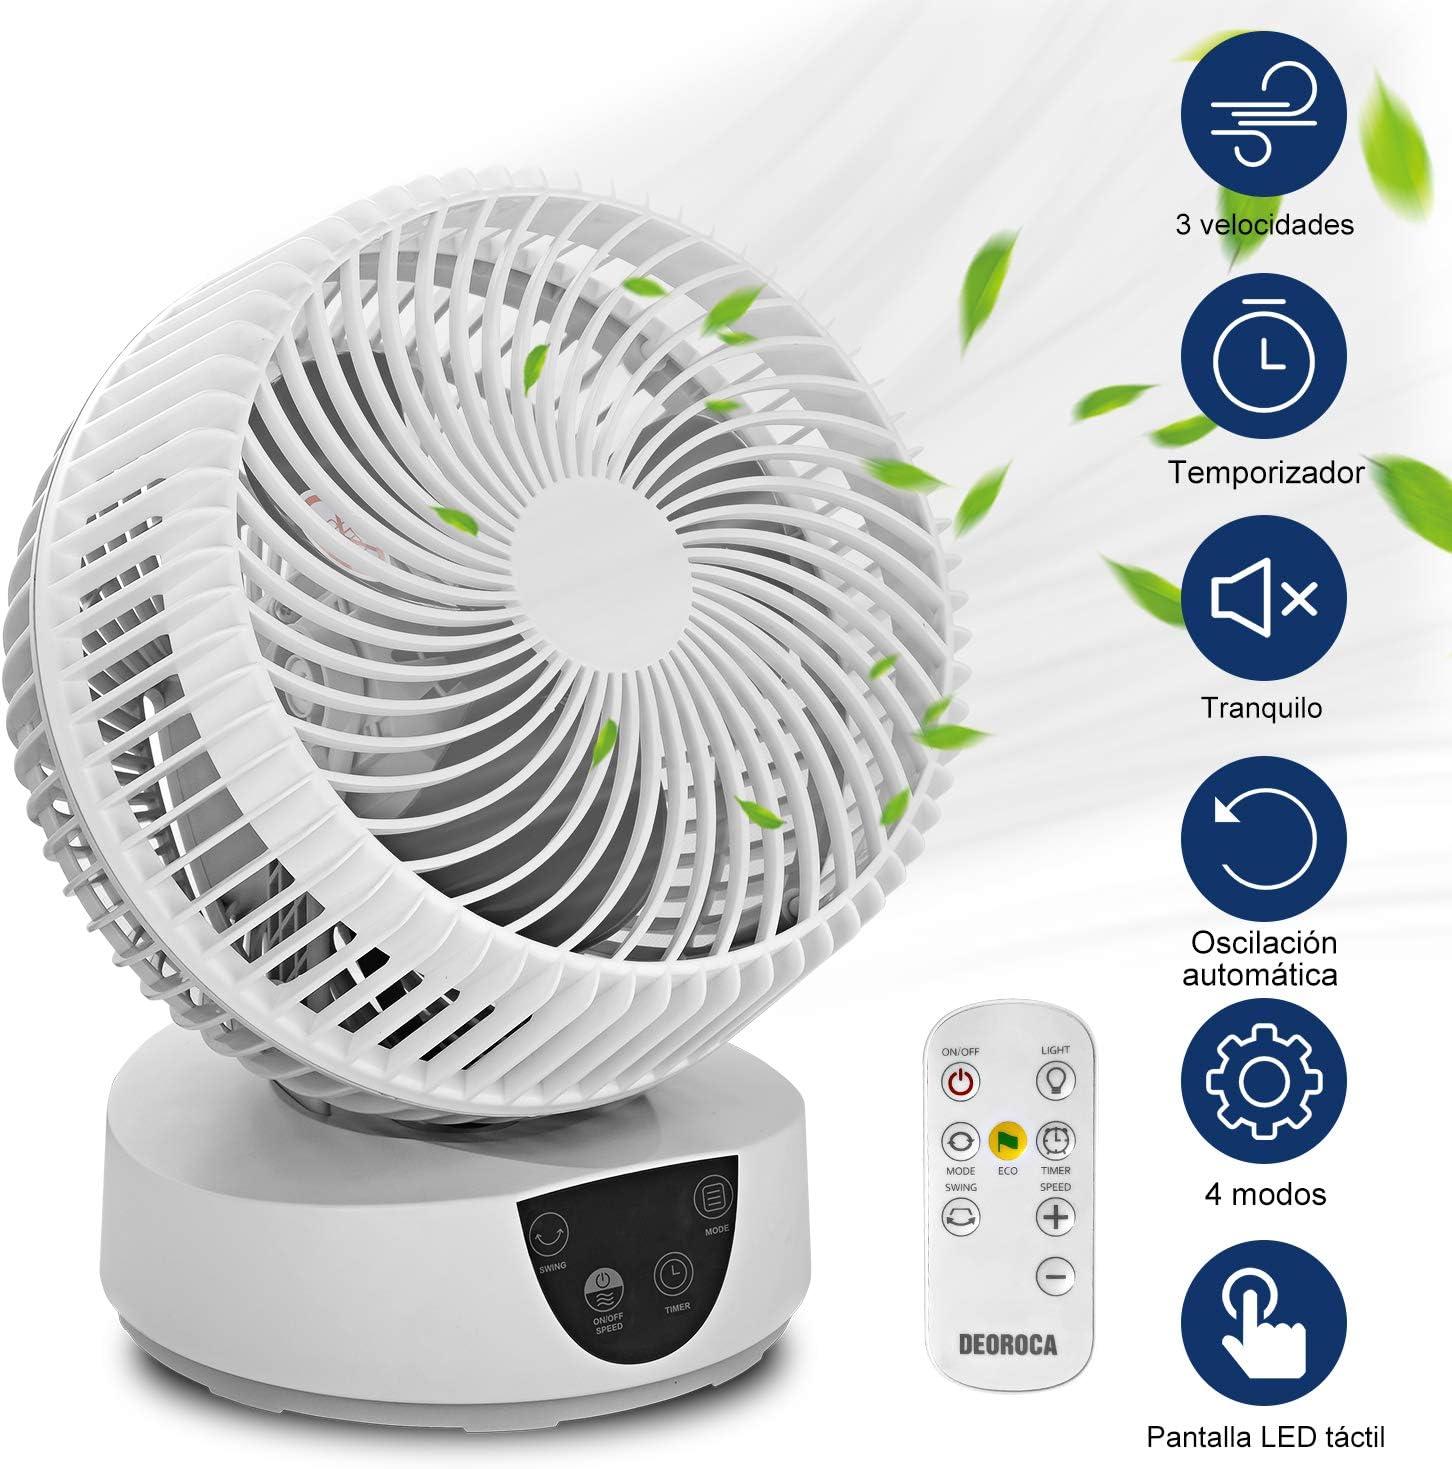 ICARE Ventiladores Sobremesas, Ventiladores Pequeños y Silenciosos de Mesa para Oficina Hogar Ventilador Frío con Pantalla LED de Temporizador, Circulante Oscilante, 3 Velocidades, 4 Modos